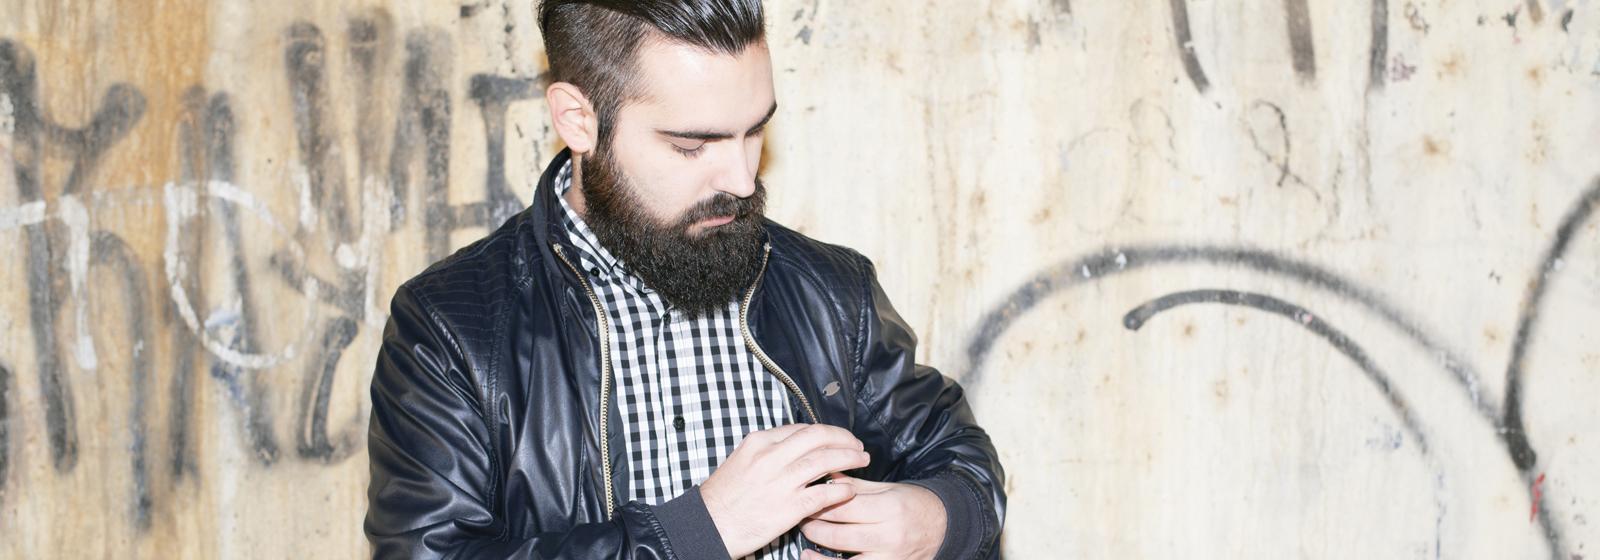 Mens cut & style